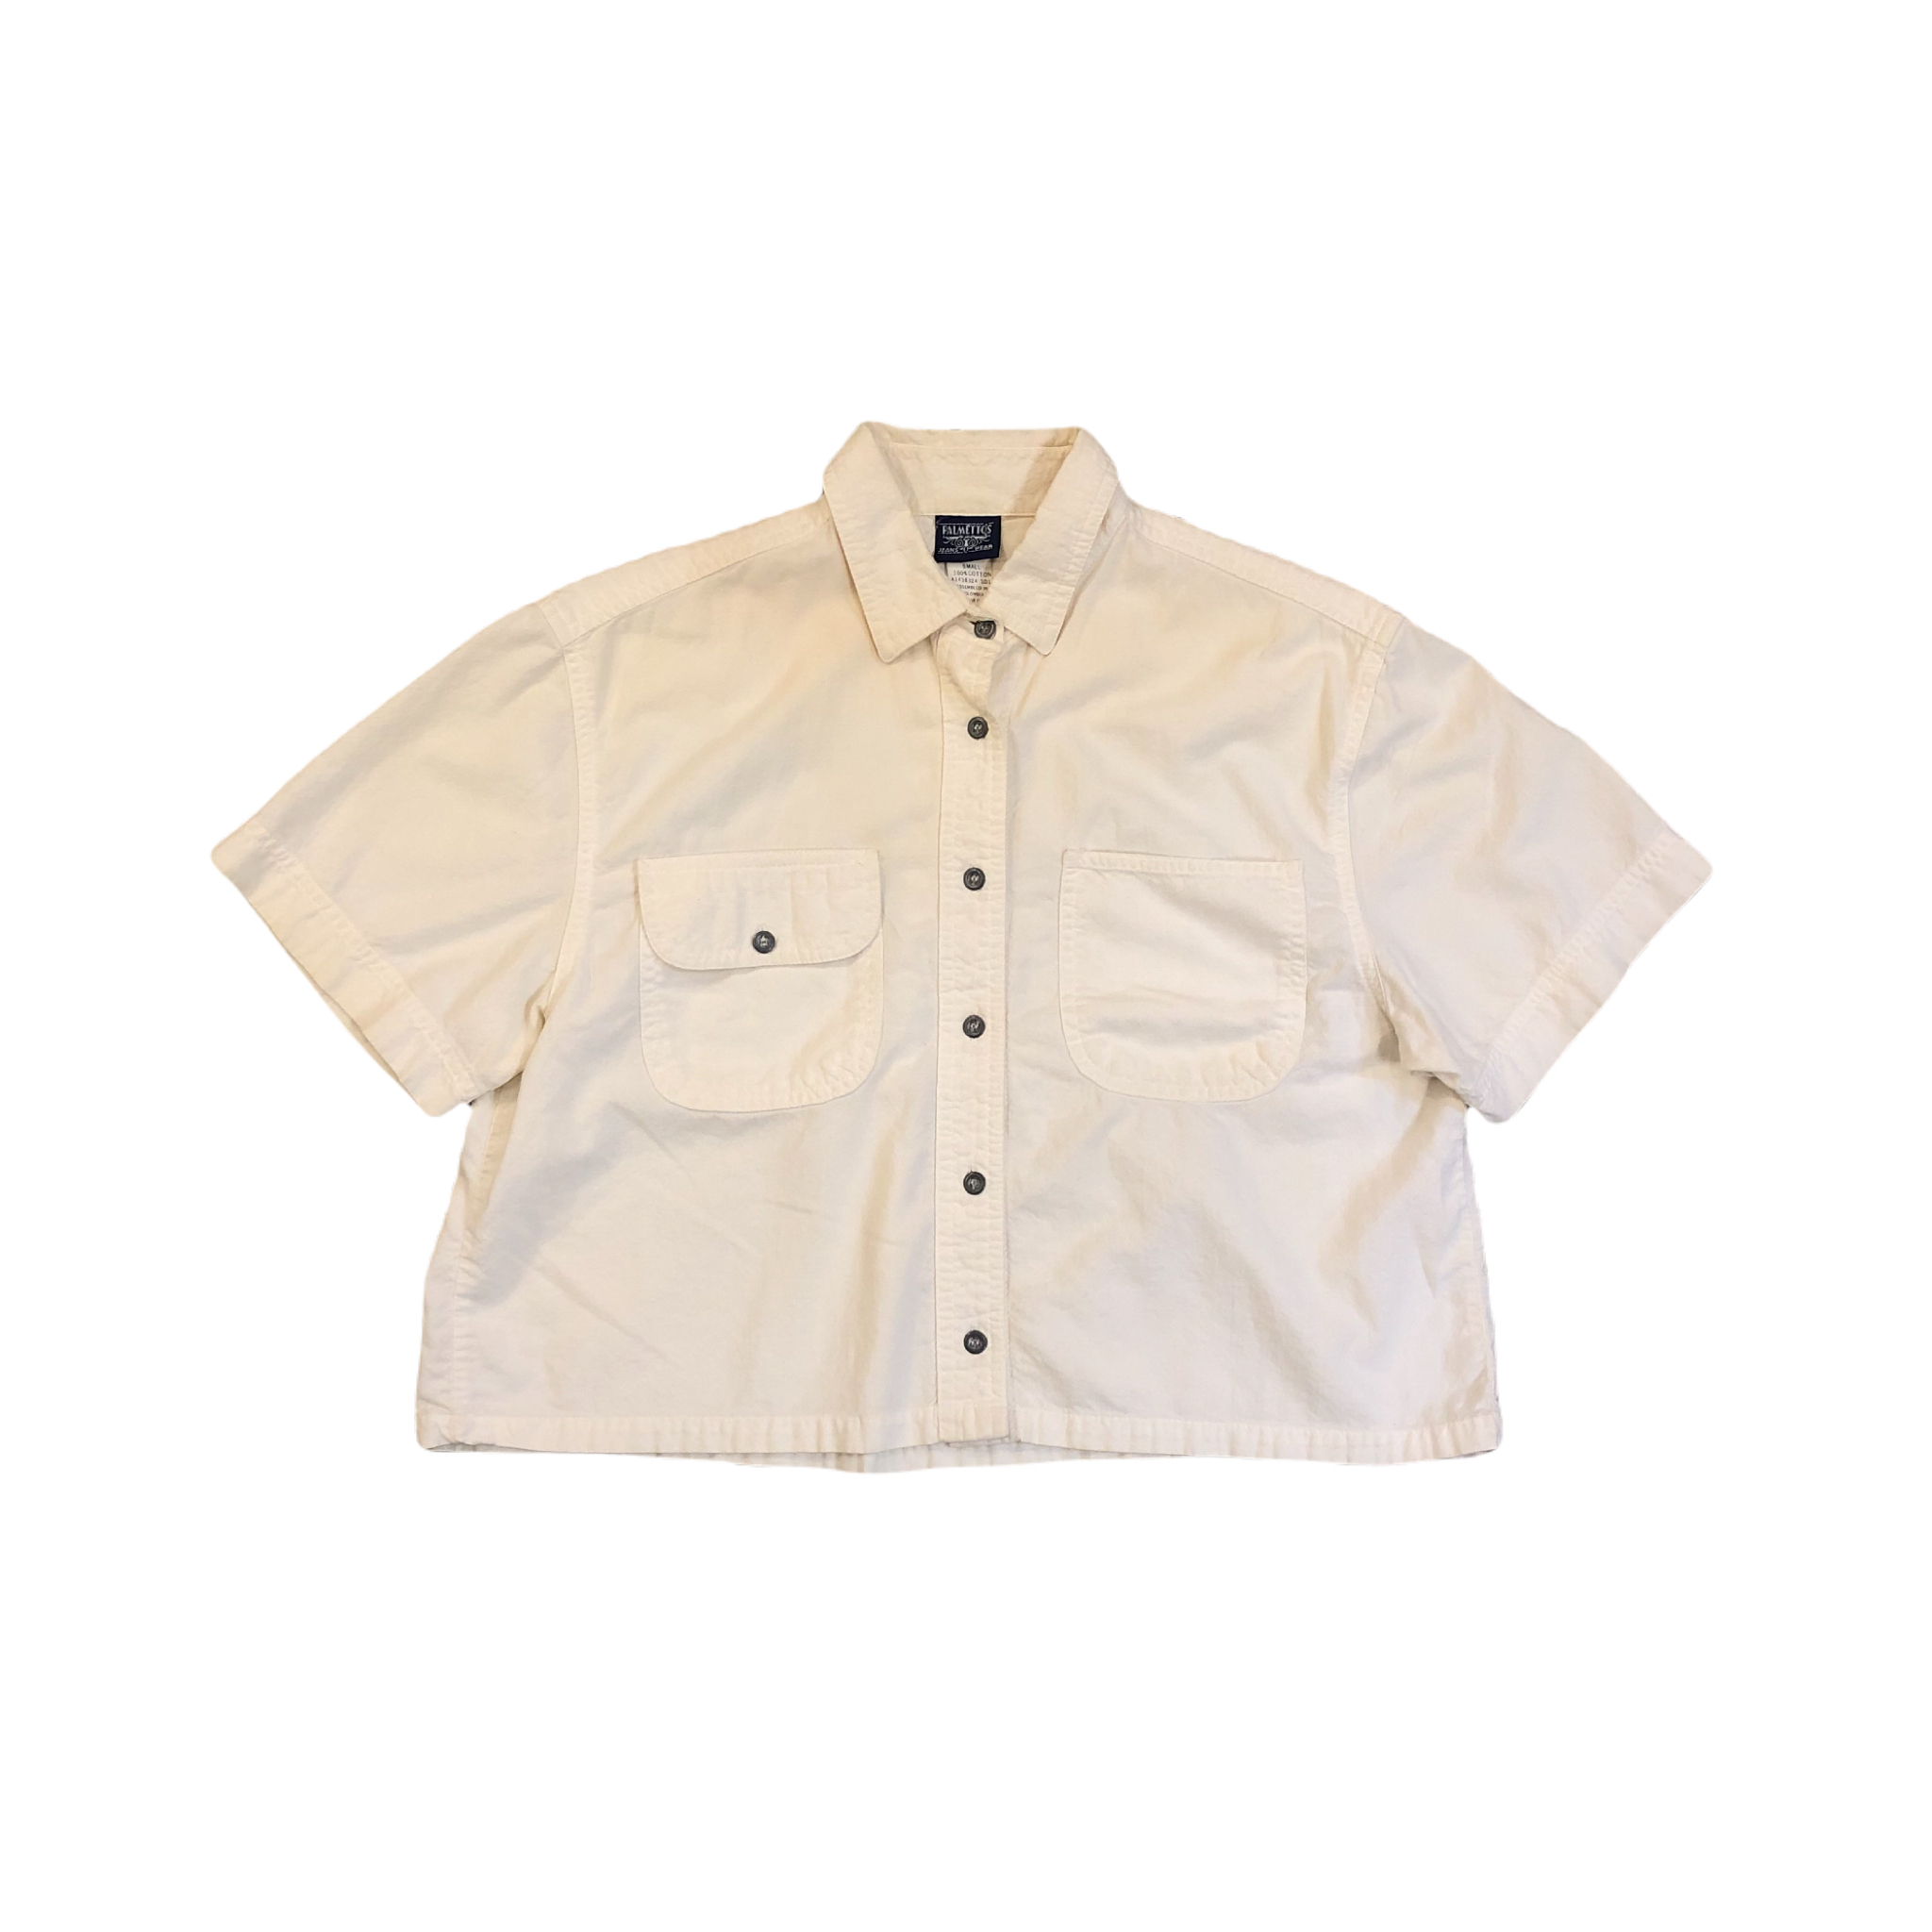 Palmetto's S/S Shirts ¥5,400+tax